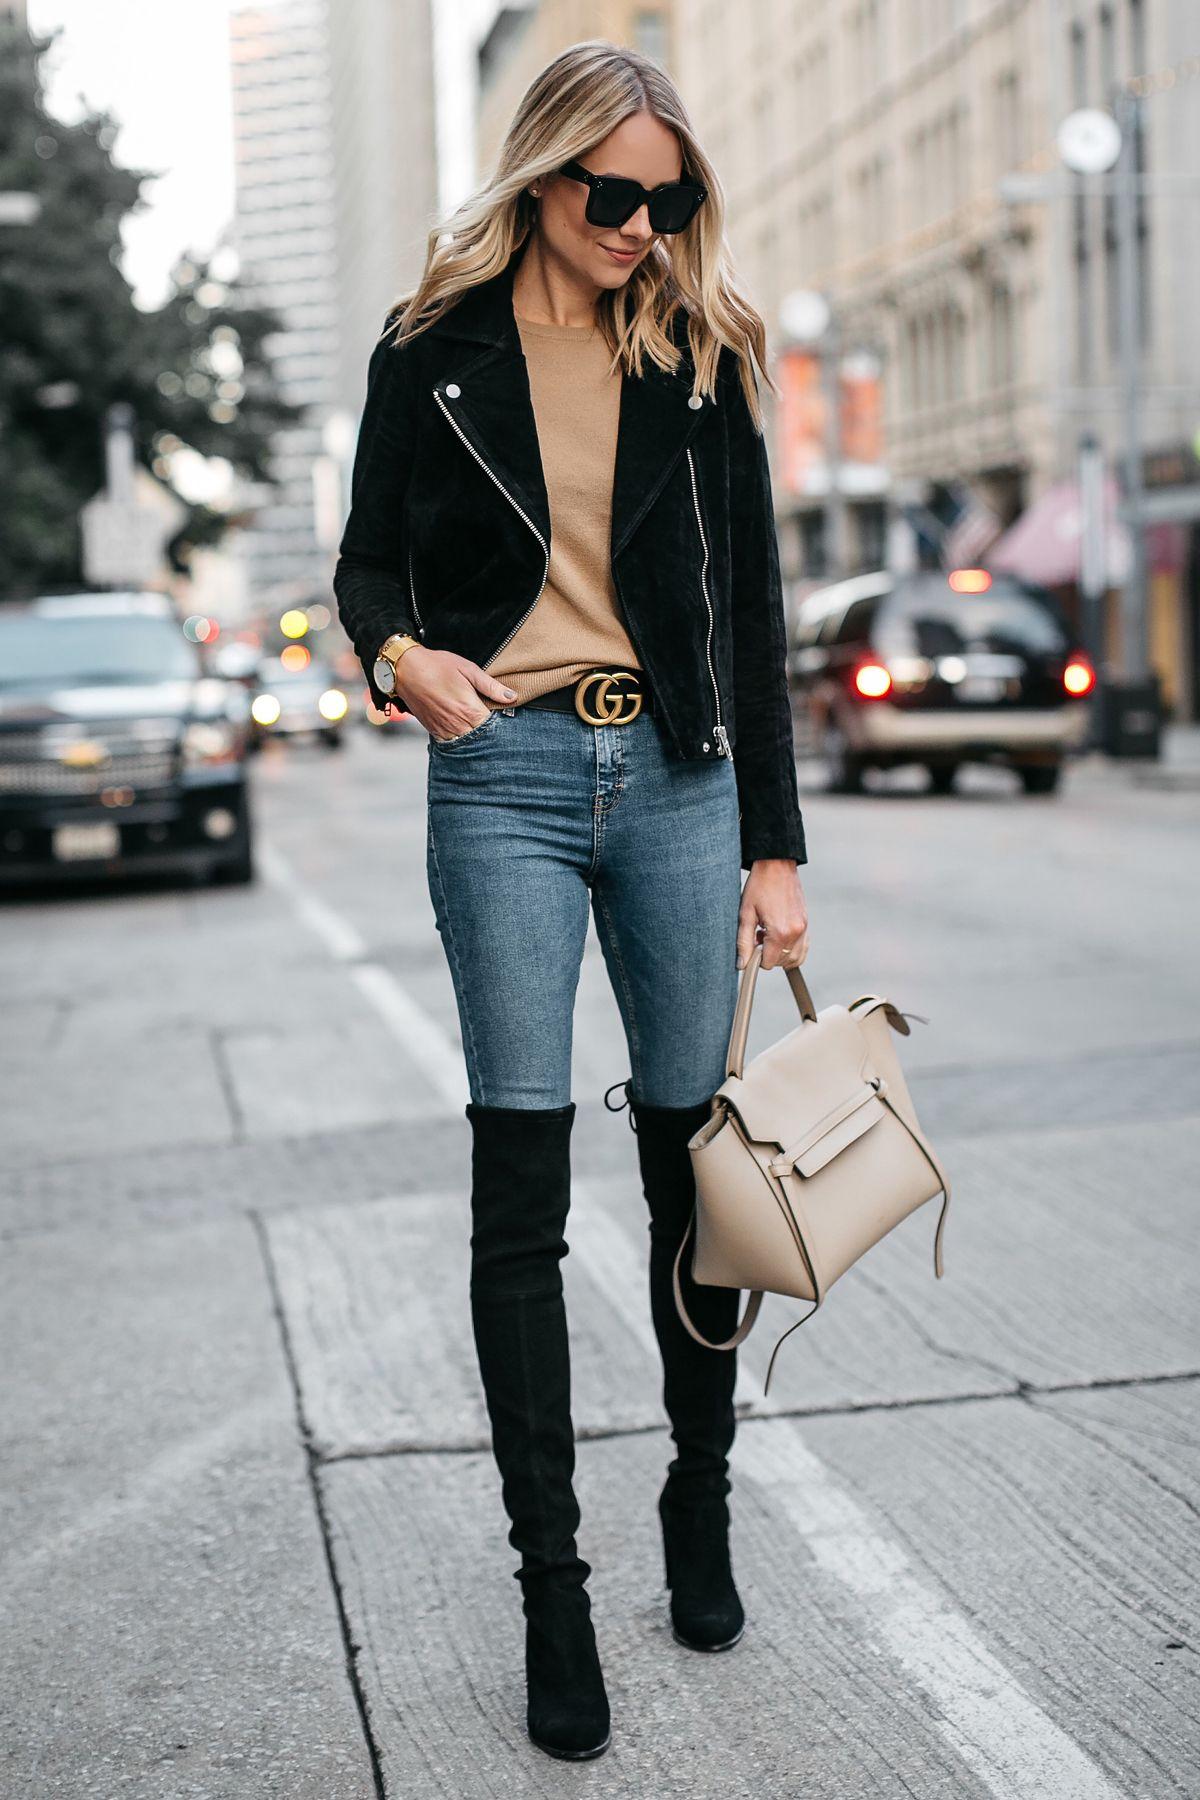 Blonde Woman Wearing Black Suede Moto Jacket Camel Sweater